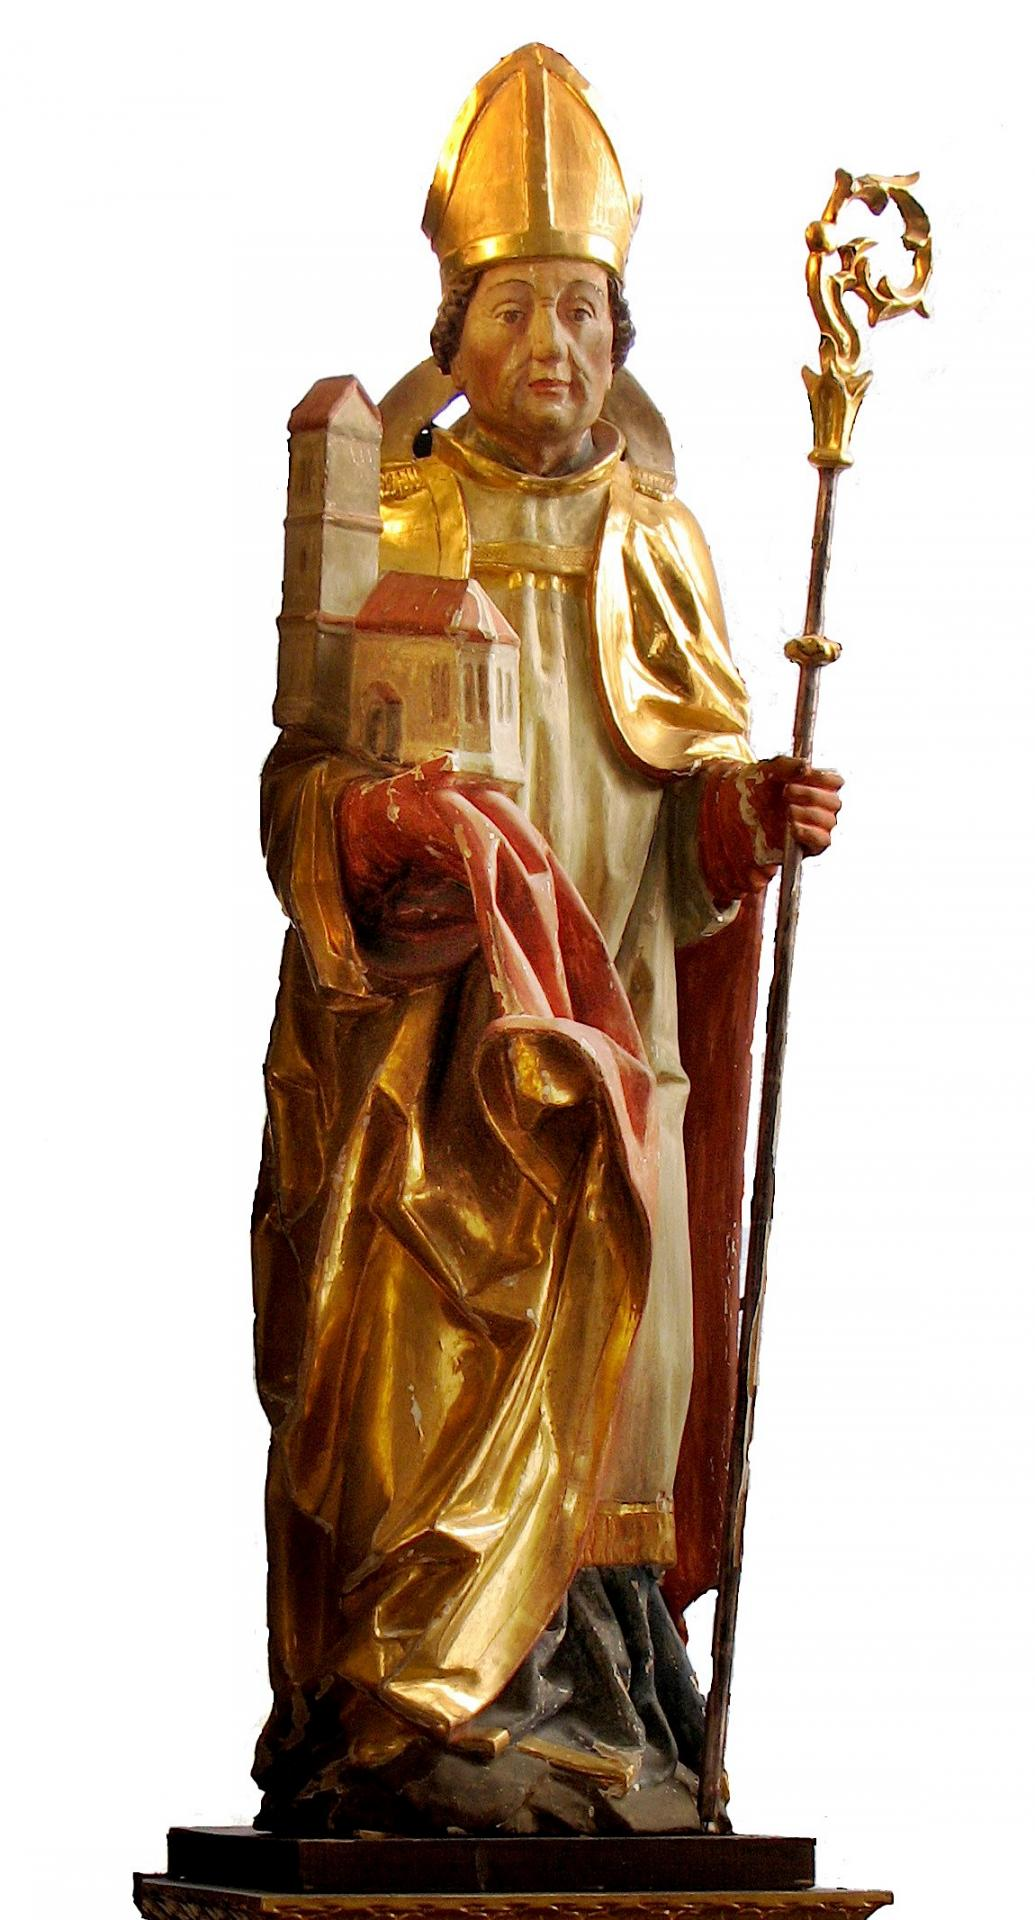 St. Wolfgang in der Pfarrkirche Parsberg